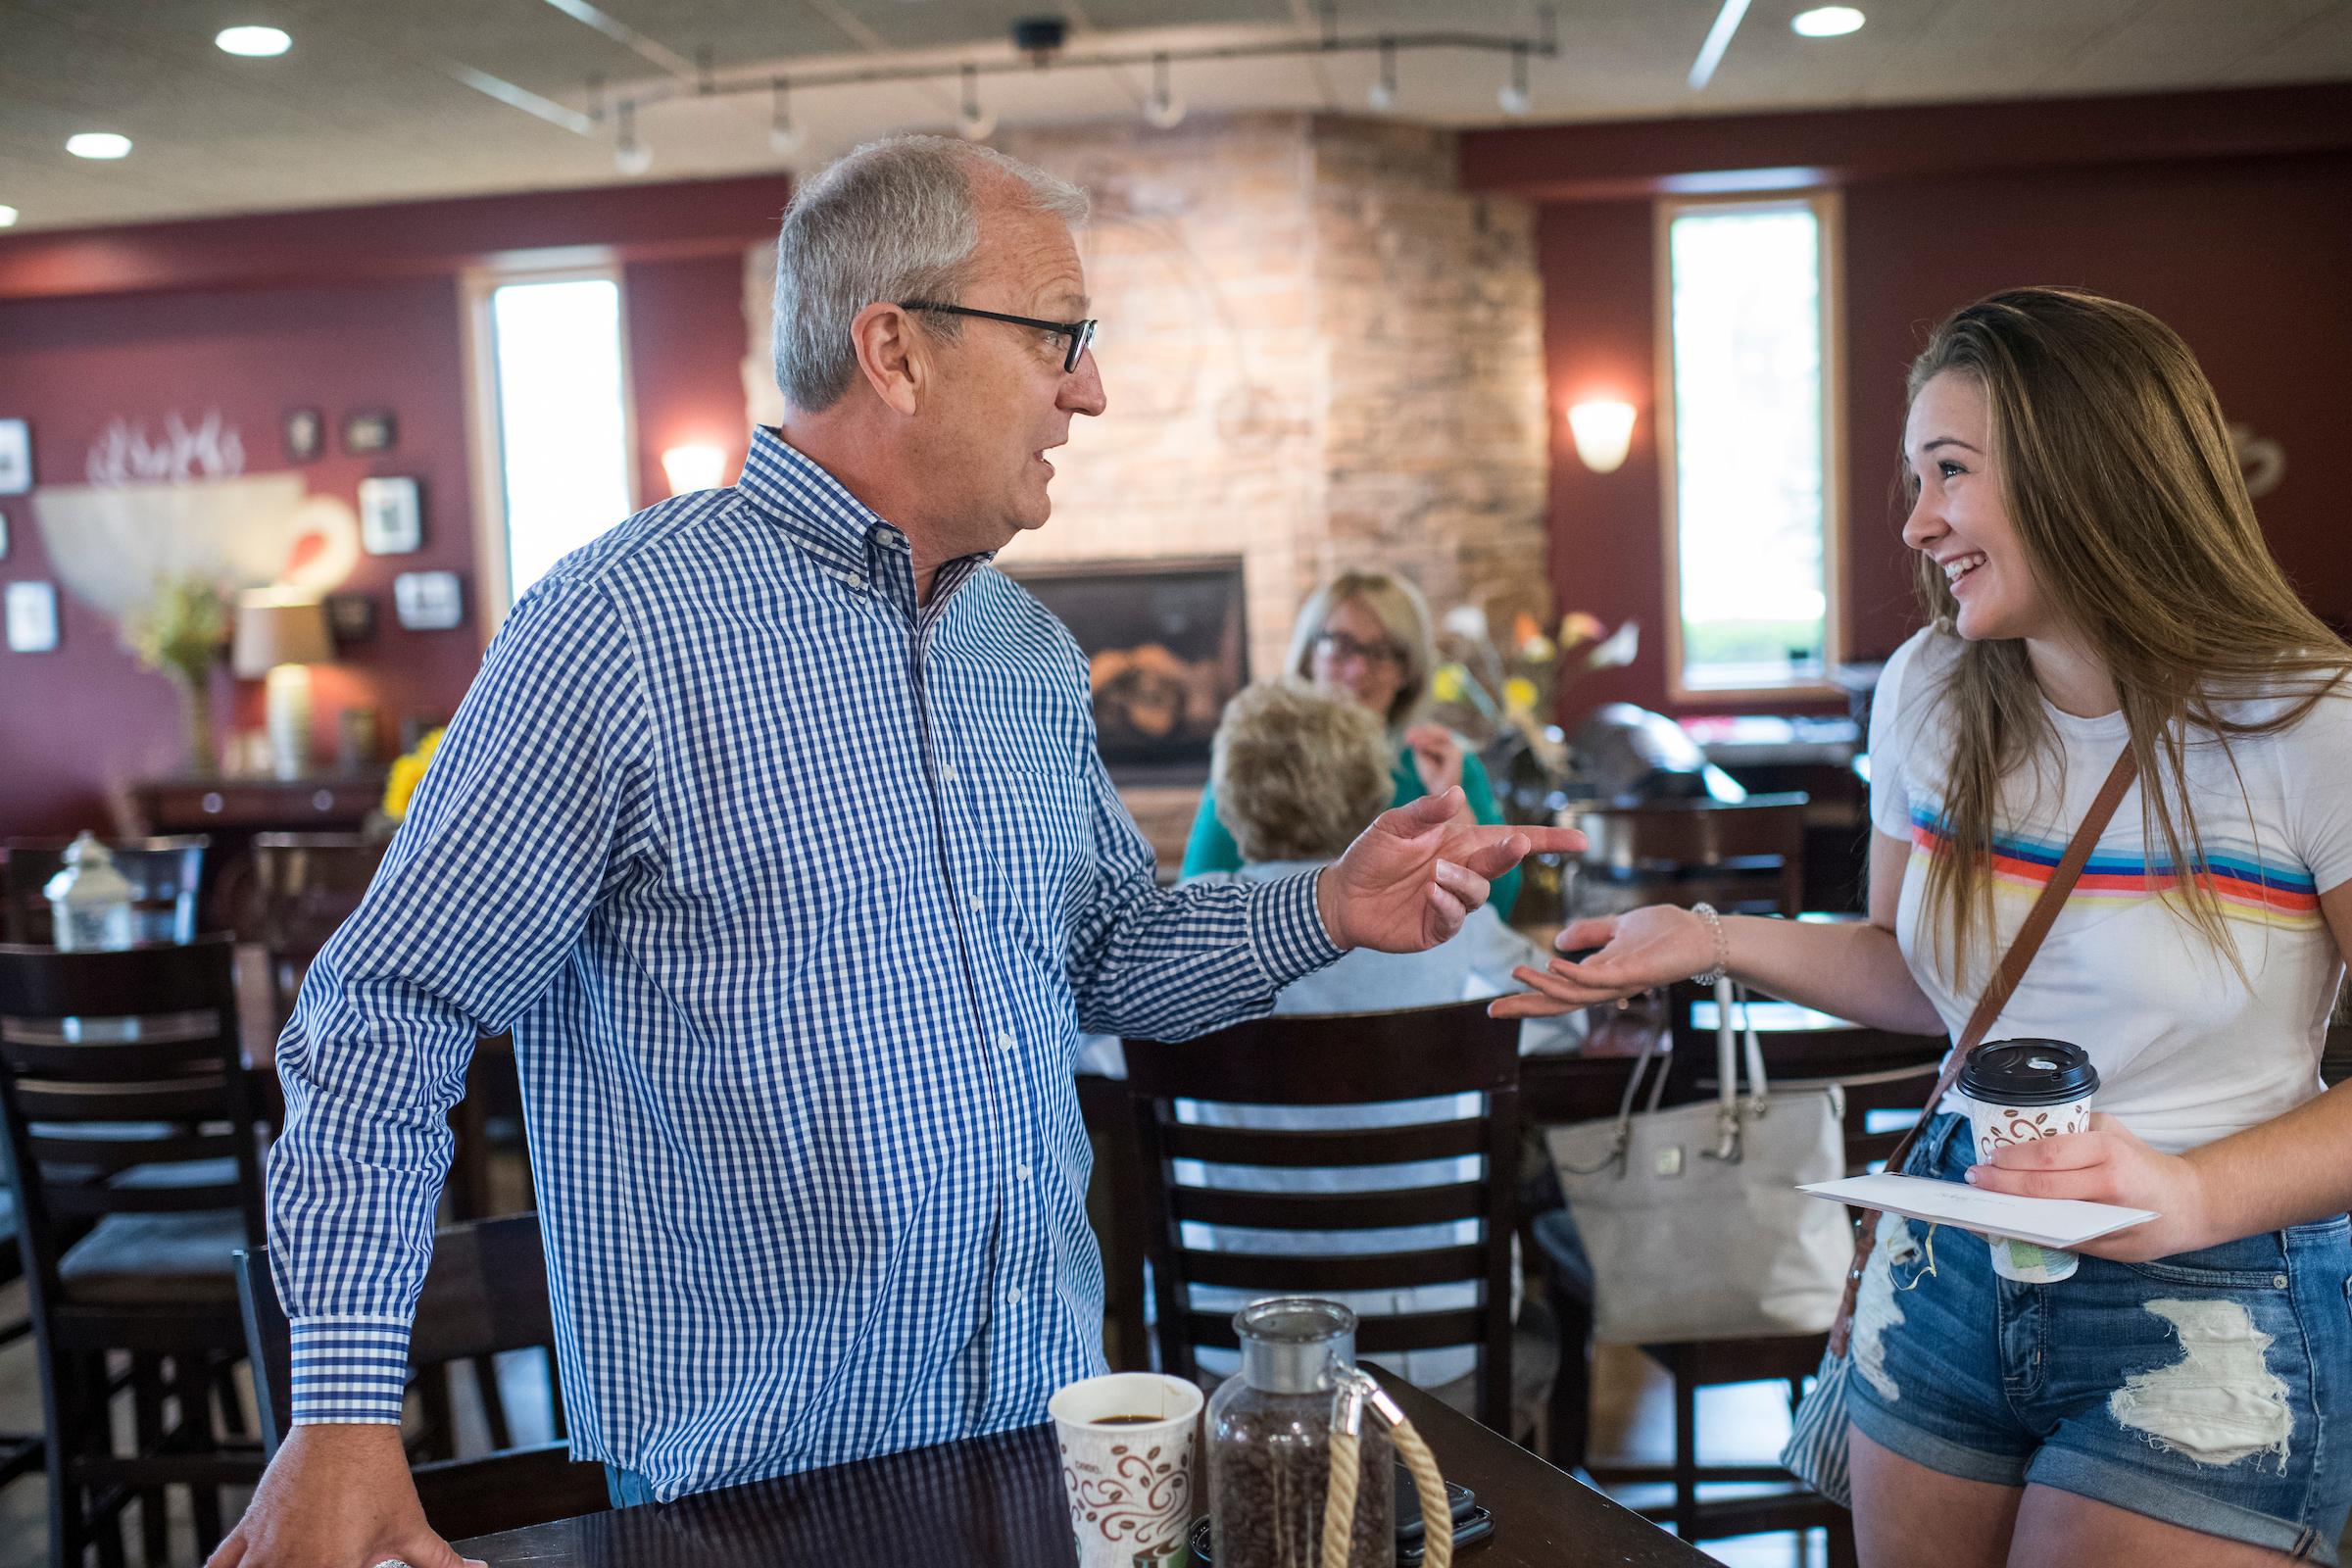 Rep. Kevin Cramer, R-N.D., talks with Sidney Larson, 18, at Boneshaker Coffee in Bismarck, N.D., on August 17, 2018. Cramer is running against Sen. Heidi Heitkamp, D-N.D., for the North Dakota Senate seat. (Photo By Tom Williams/CQ Roll Call)